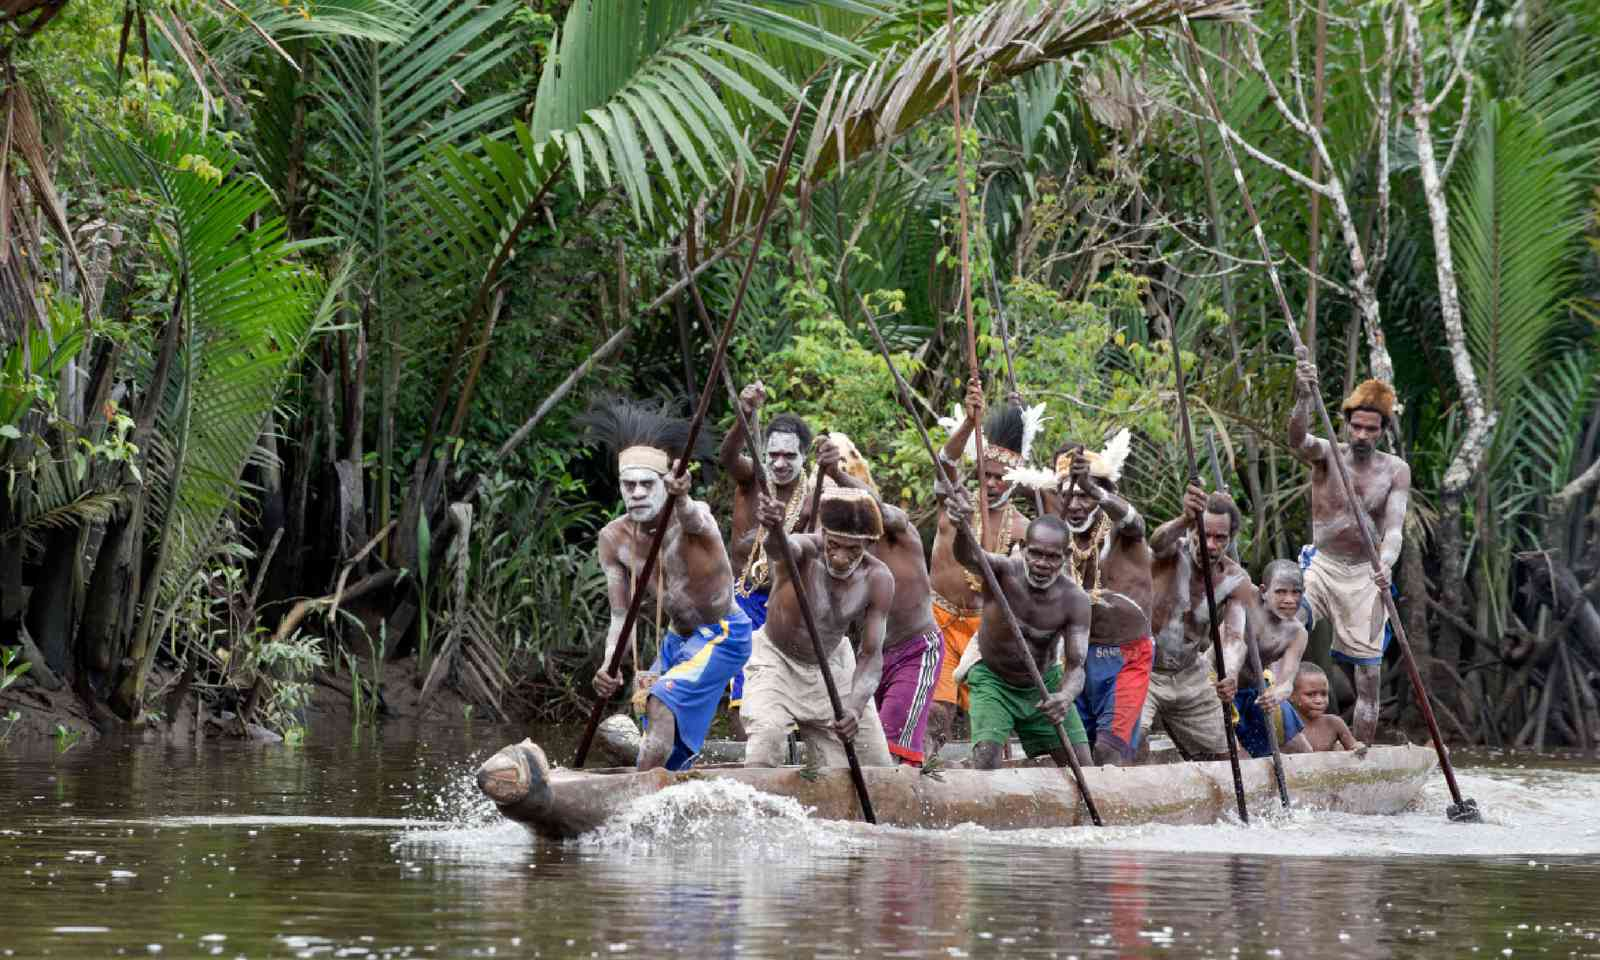 War canoe, Papua New Guinea (Shutterstock)